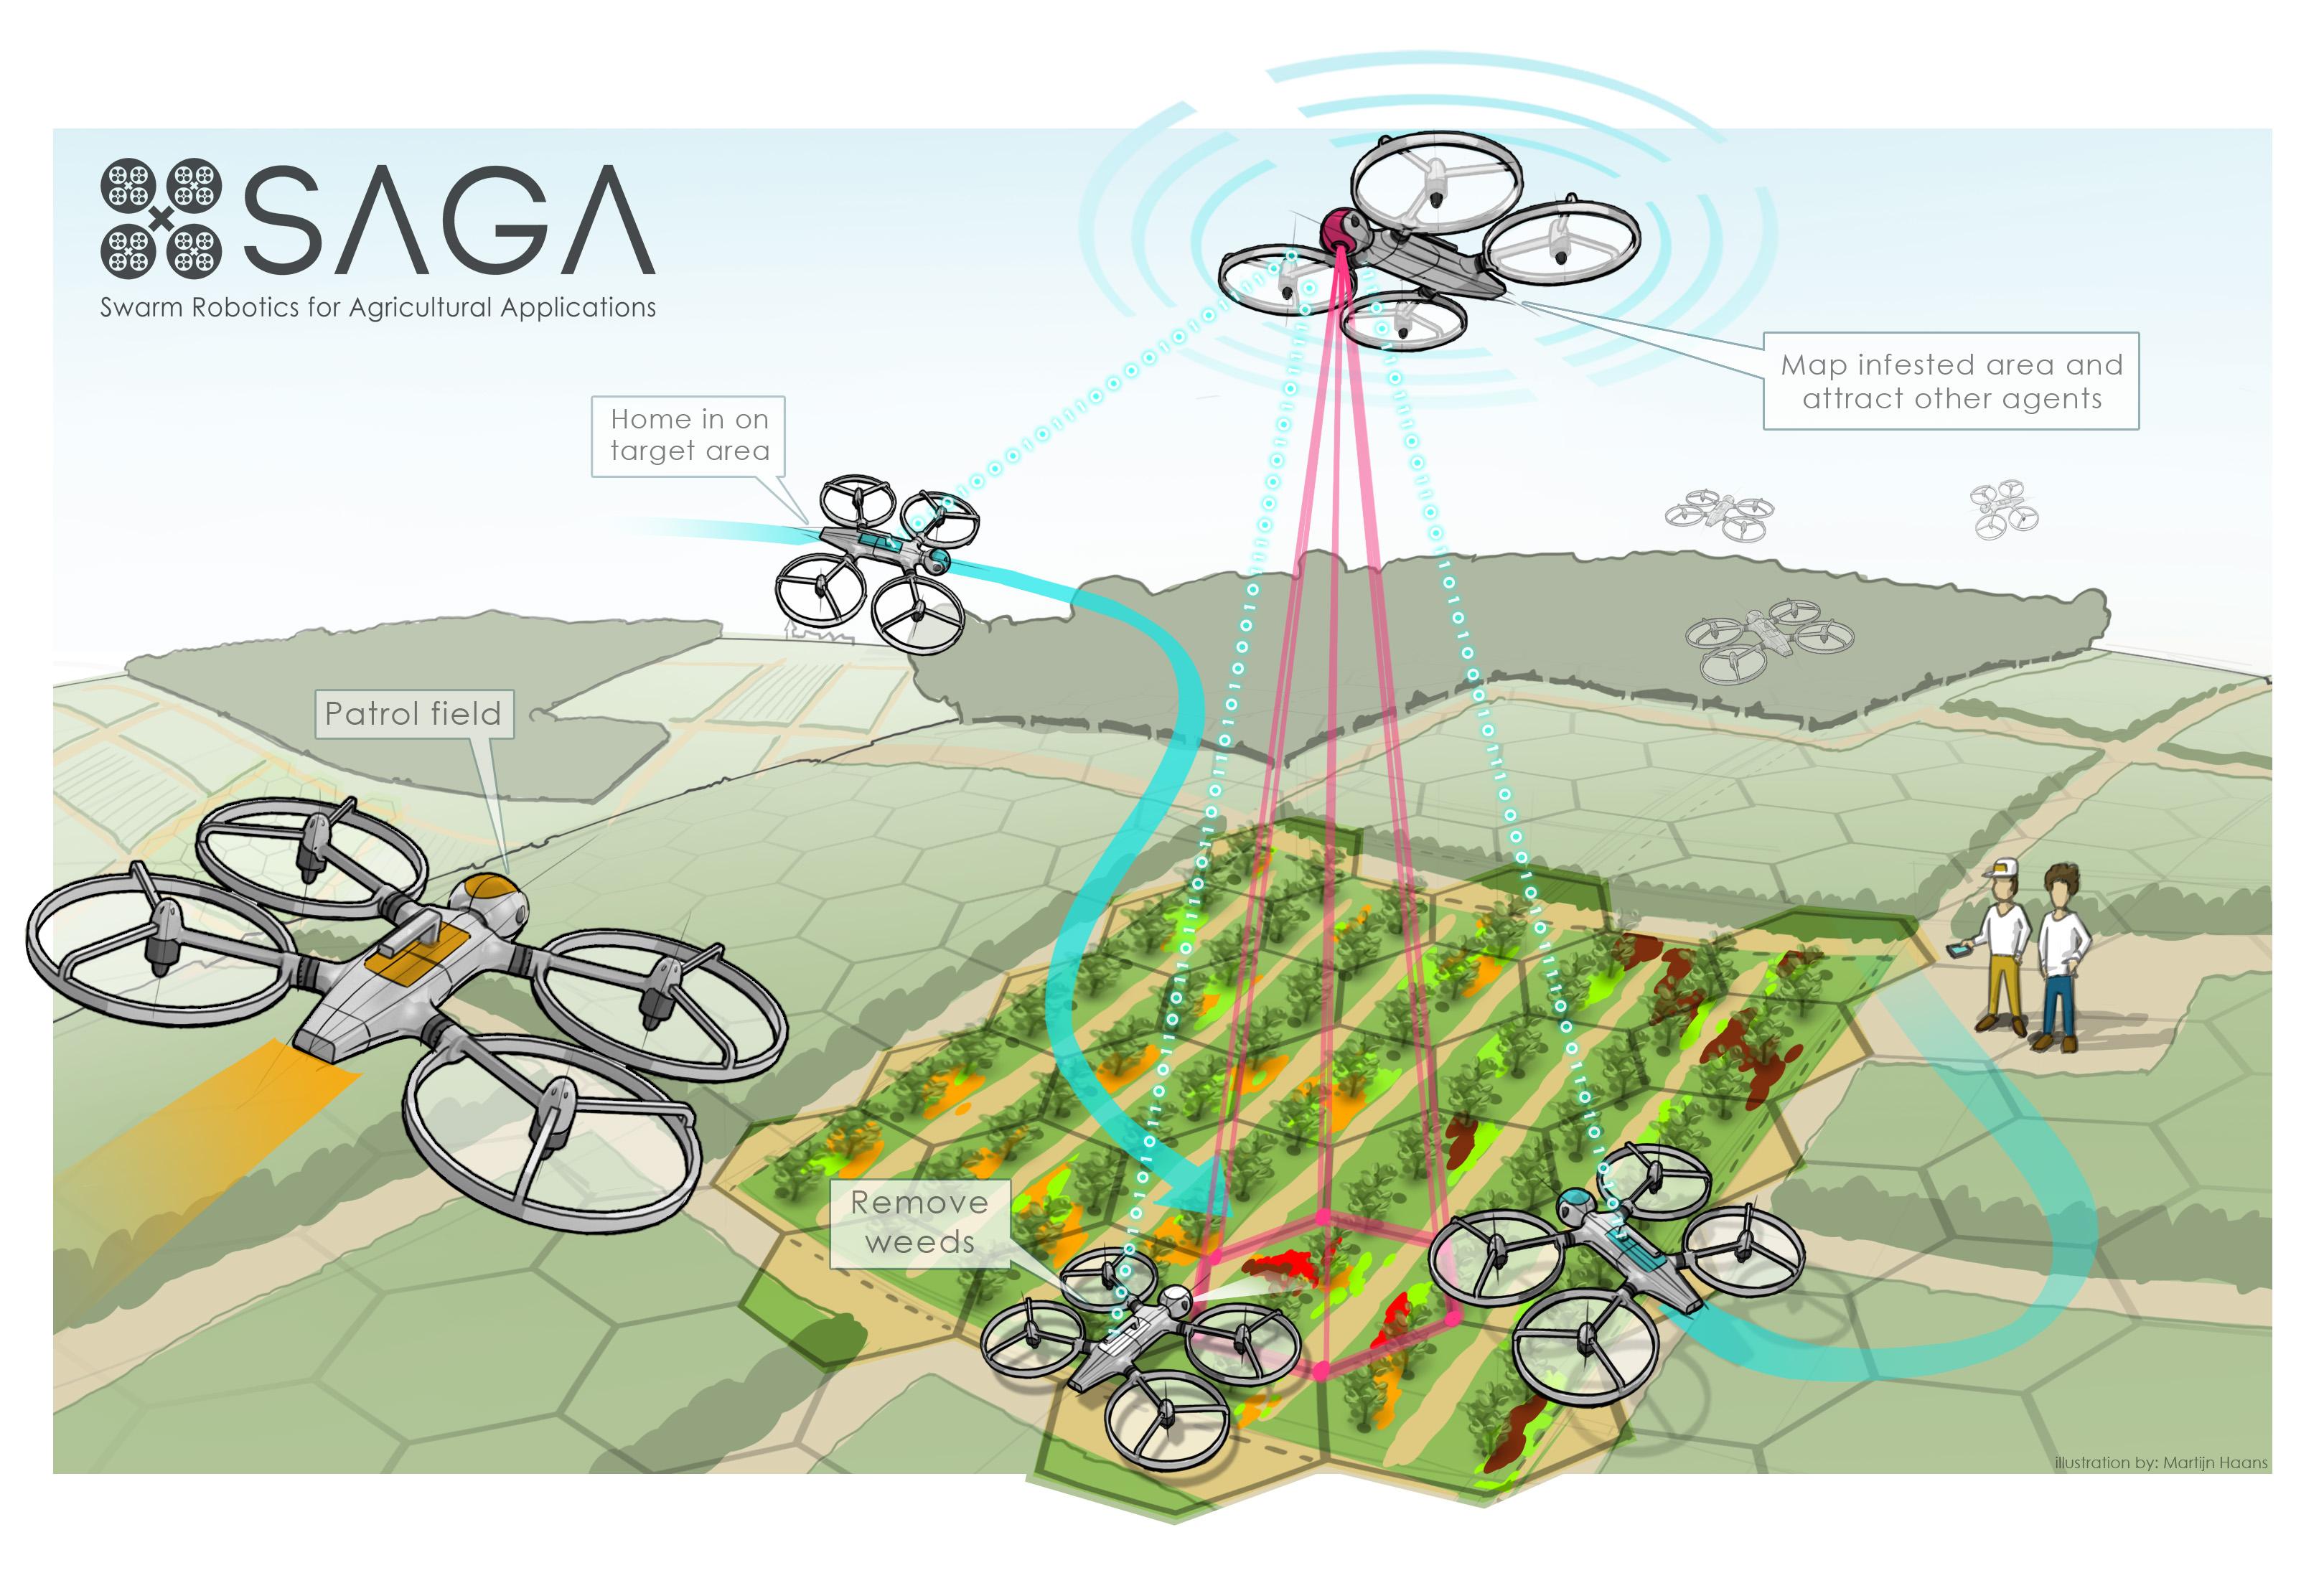 drawing of the SAGA solution